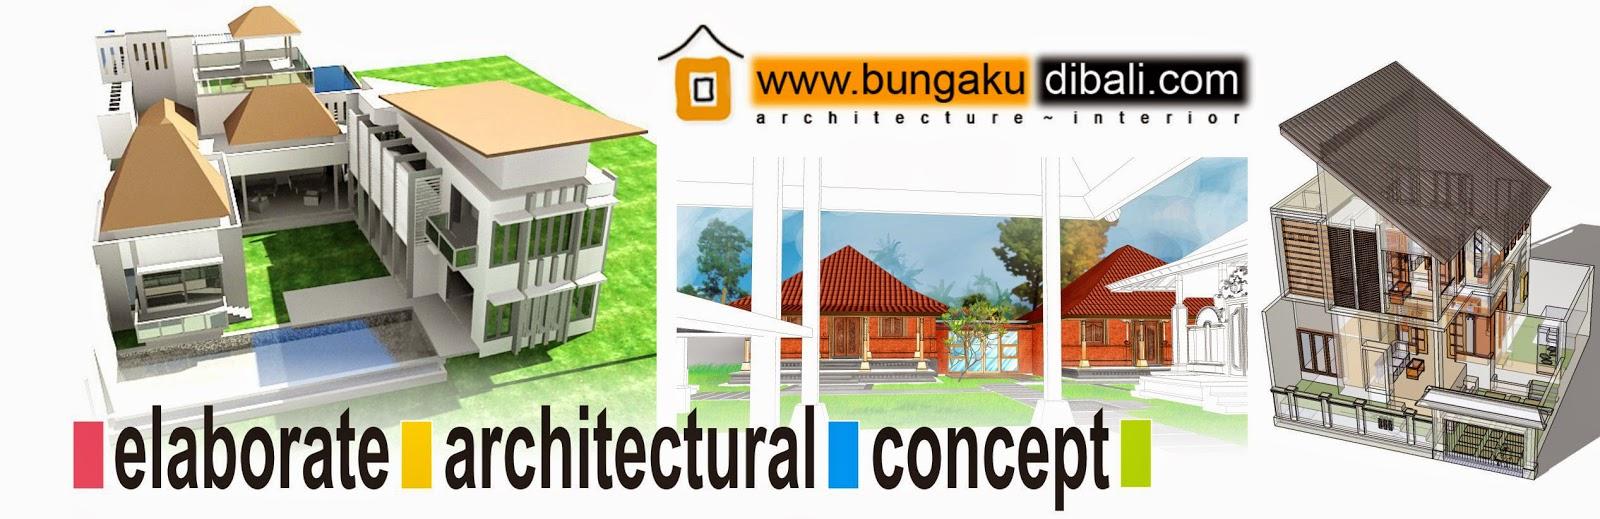 About Us Bungaku Di Bali Didalam Menghasilkan Karya Arsitektur Dan Interior Yang Bebas Terarah Sangat Berkaitan Dengan Sekian Banyak Pelaku Profesional Antara Lain Civil